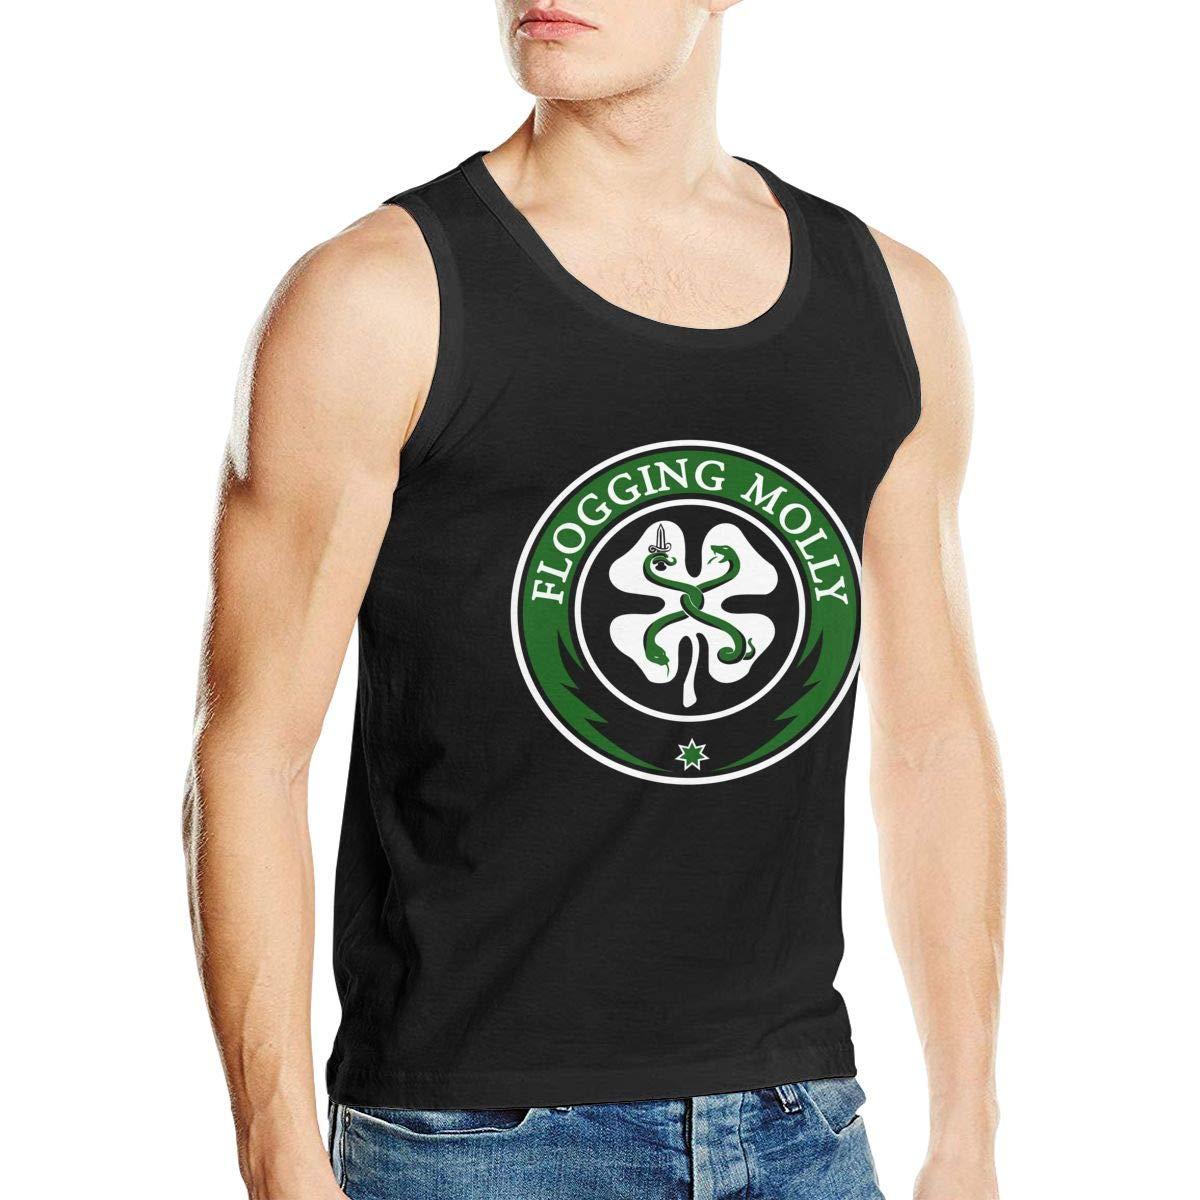 CharlieRGill Flogging Molly Mens Sports Comfort Sleeveless Tank Vest Tee